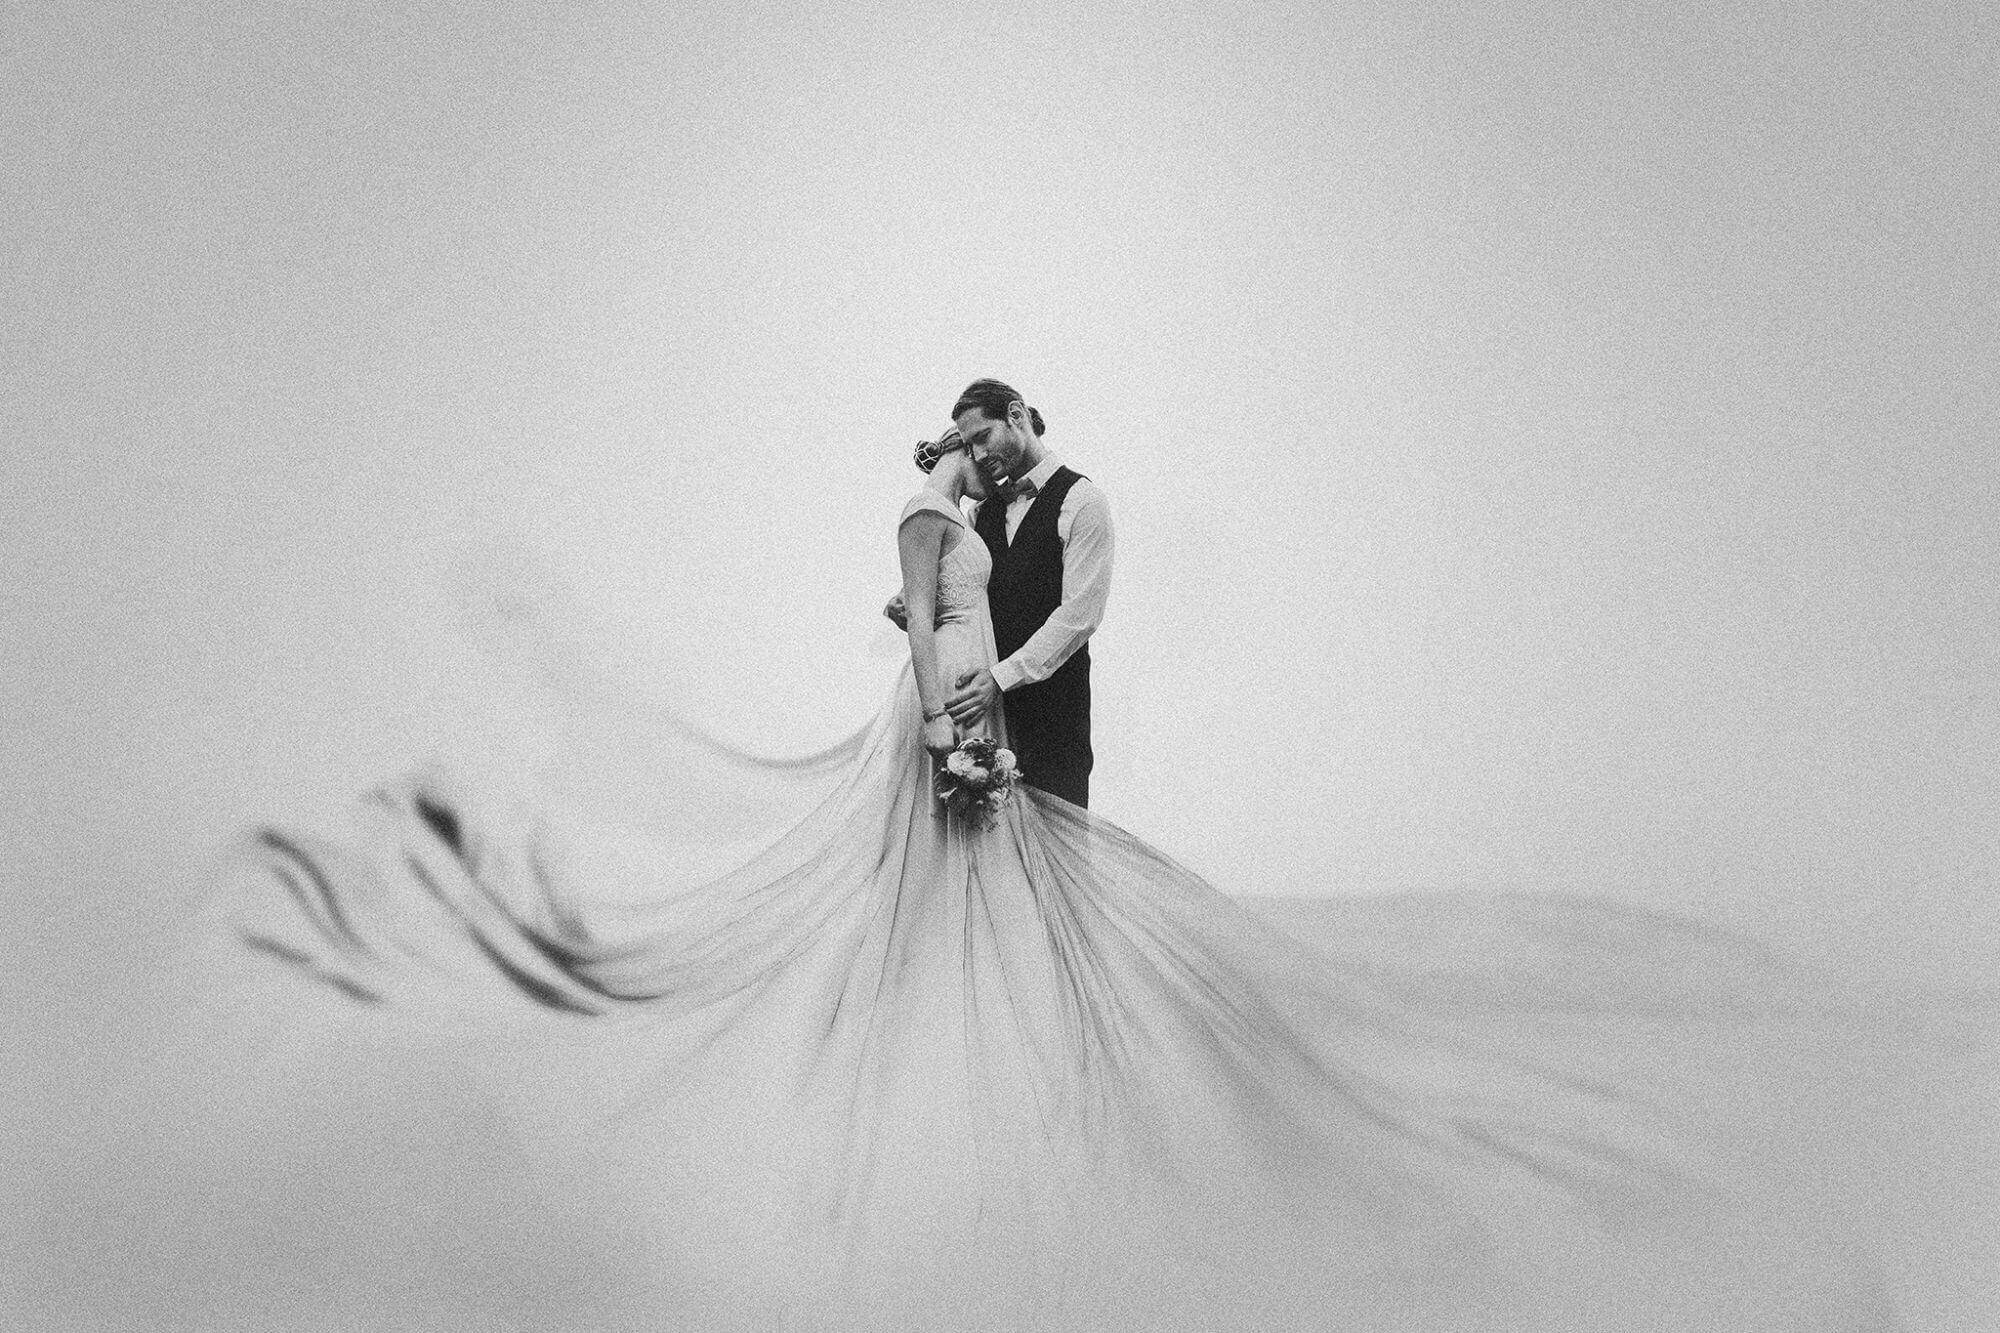 Виктор Хамке, Германия / Victor Hamke, Germany, Победитель категории «Свадьба», Фотоконкурс Hasselblad Masters